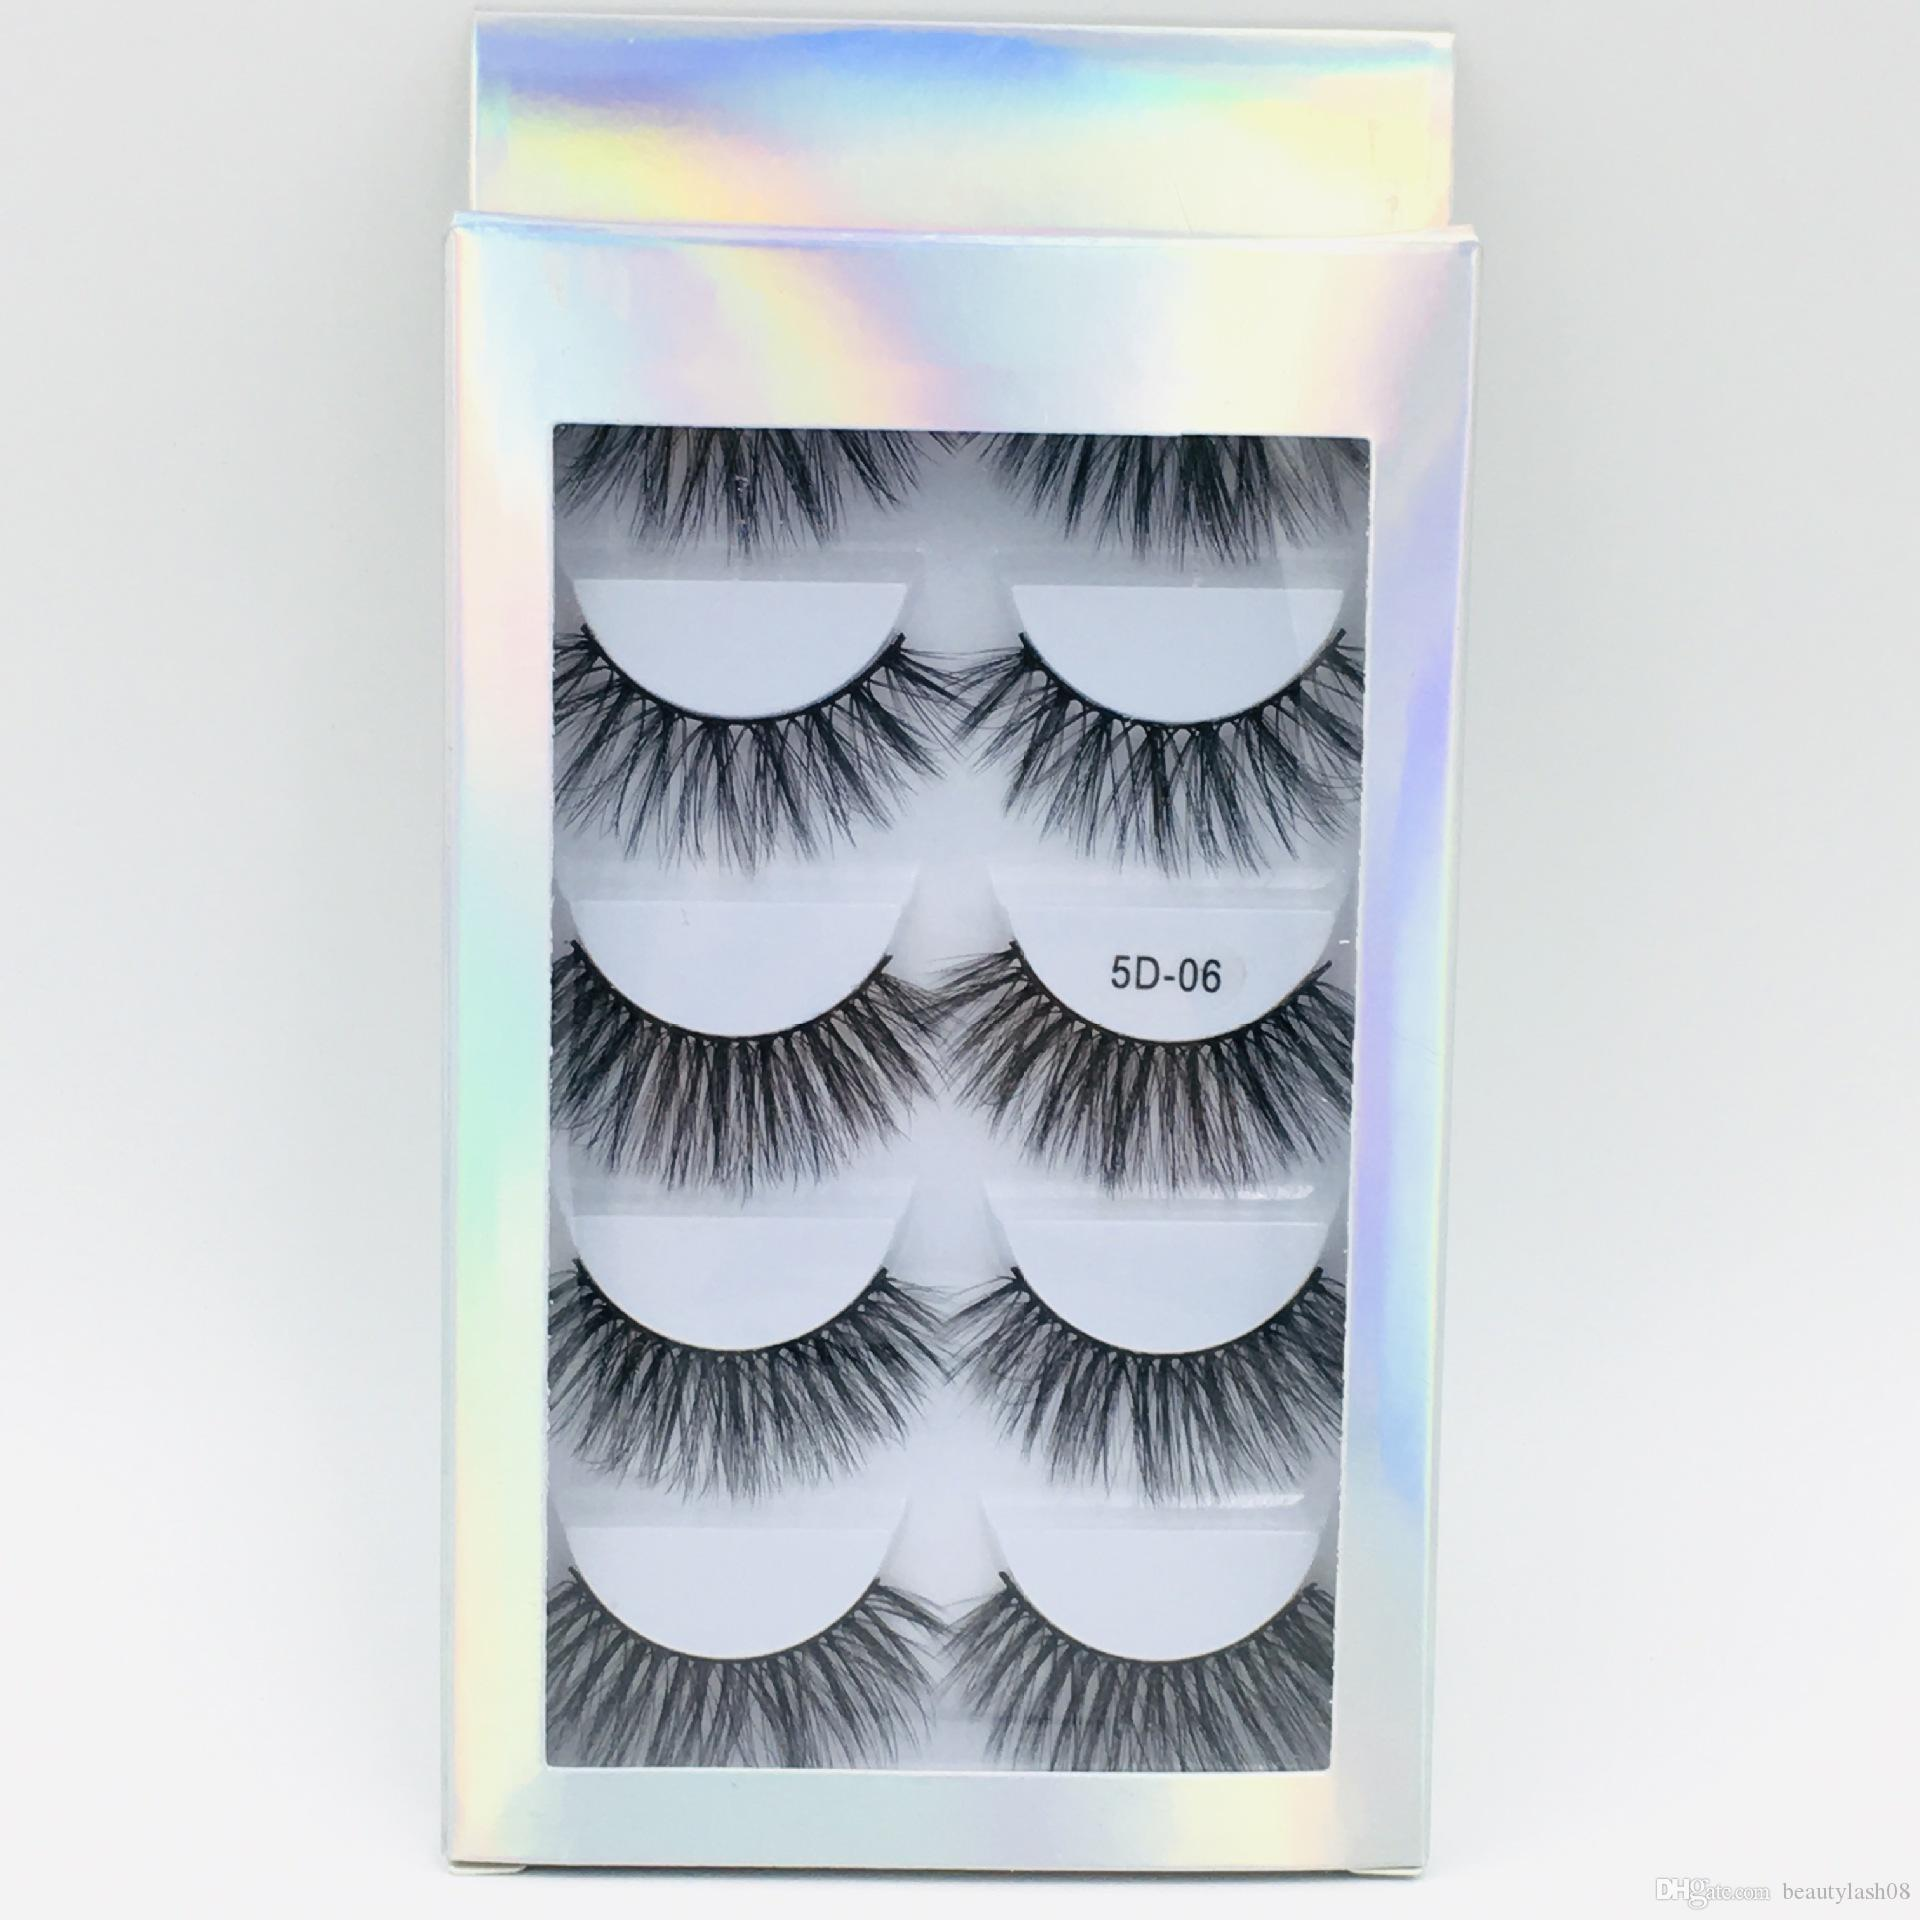 5D Mink eyelash False Eyelashes Natural Long Fake Eyelash Extension Thick Cross Faux 3d Mink Eyelashes Eye Makeup